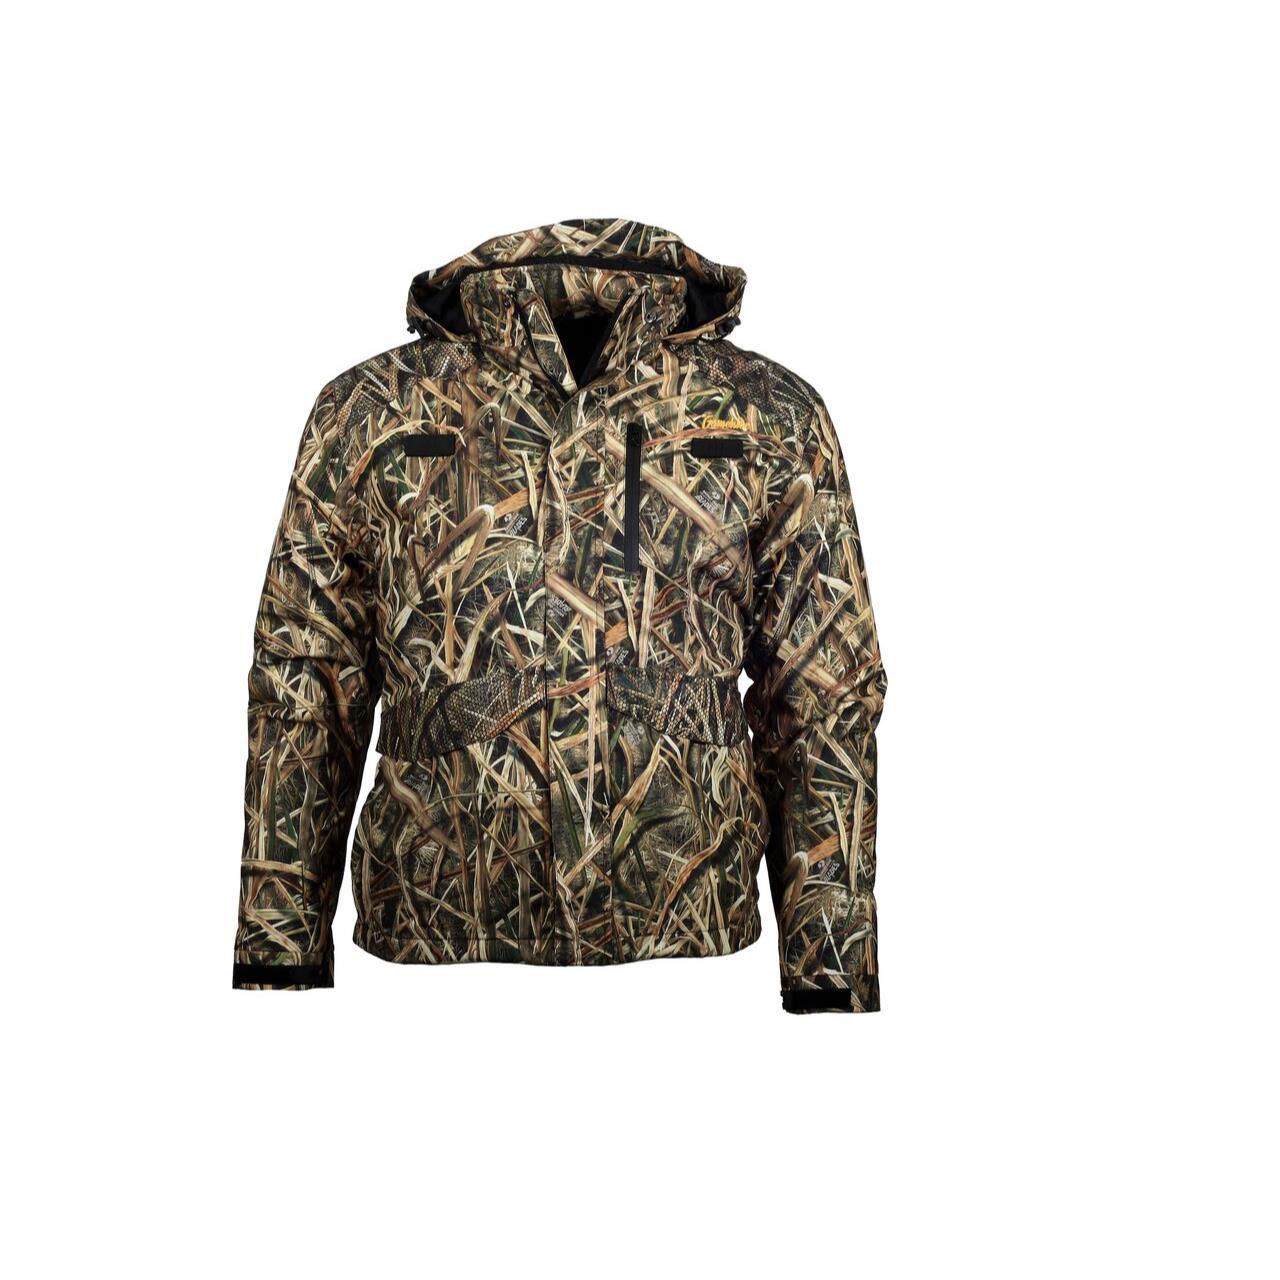 Gamehide Slough Creek Jacket - Max-5 - 769961404998